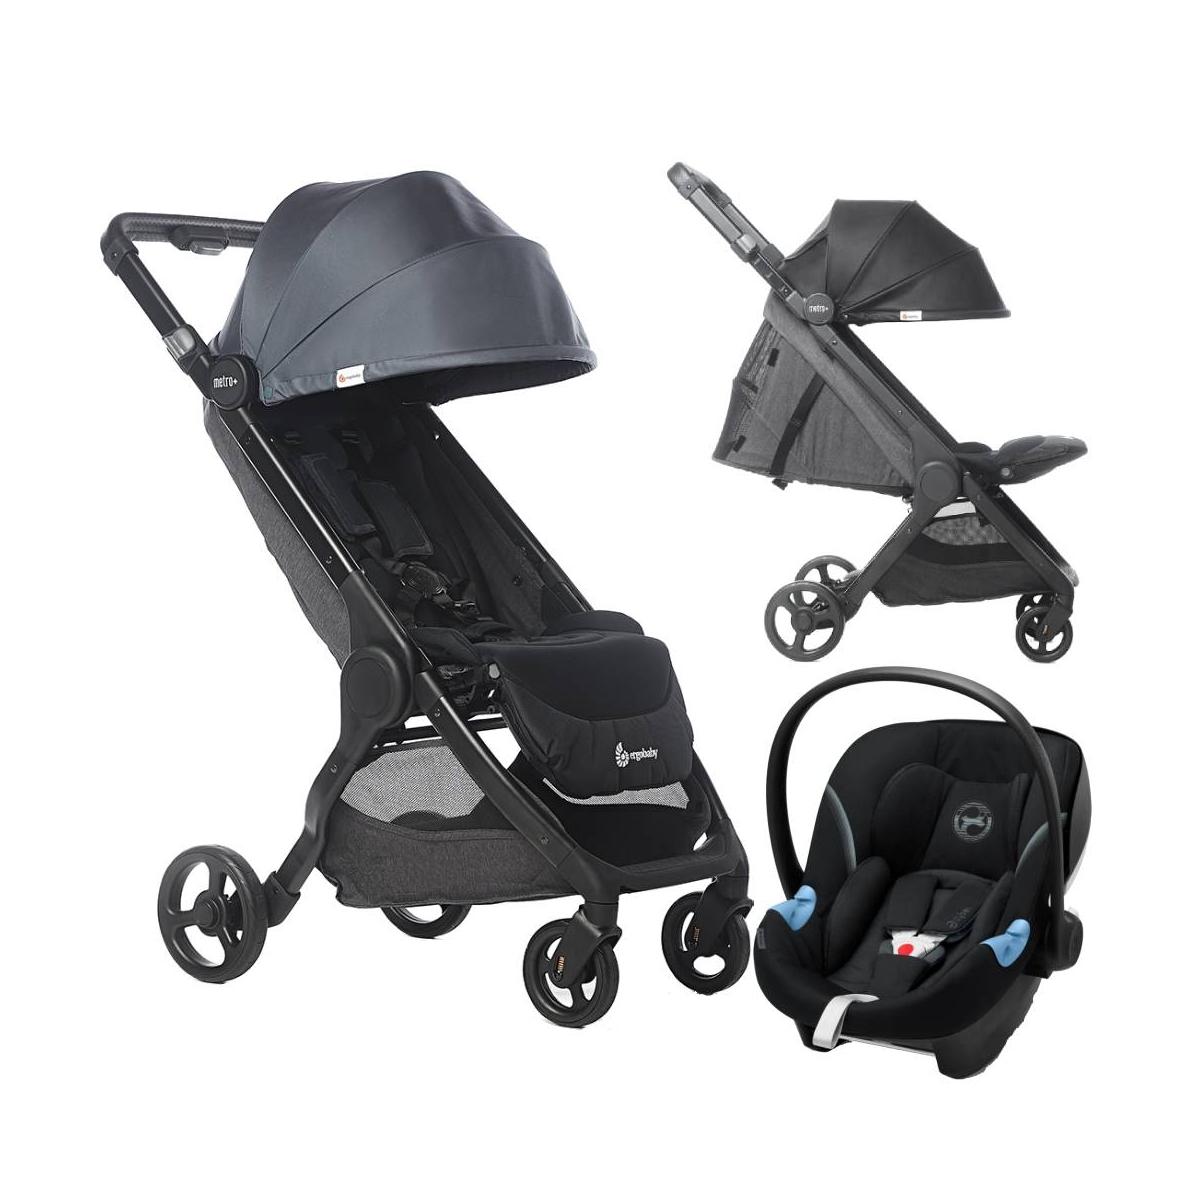 Ergobaby 3in1 Metro+ Compact City Stroller-Slate Grey (2021)